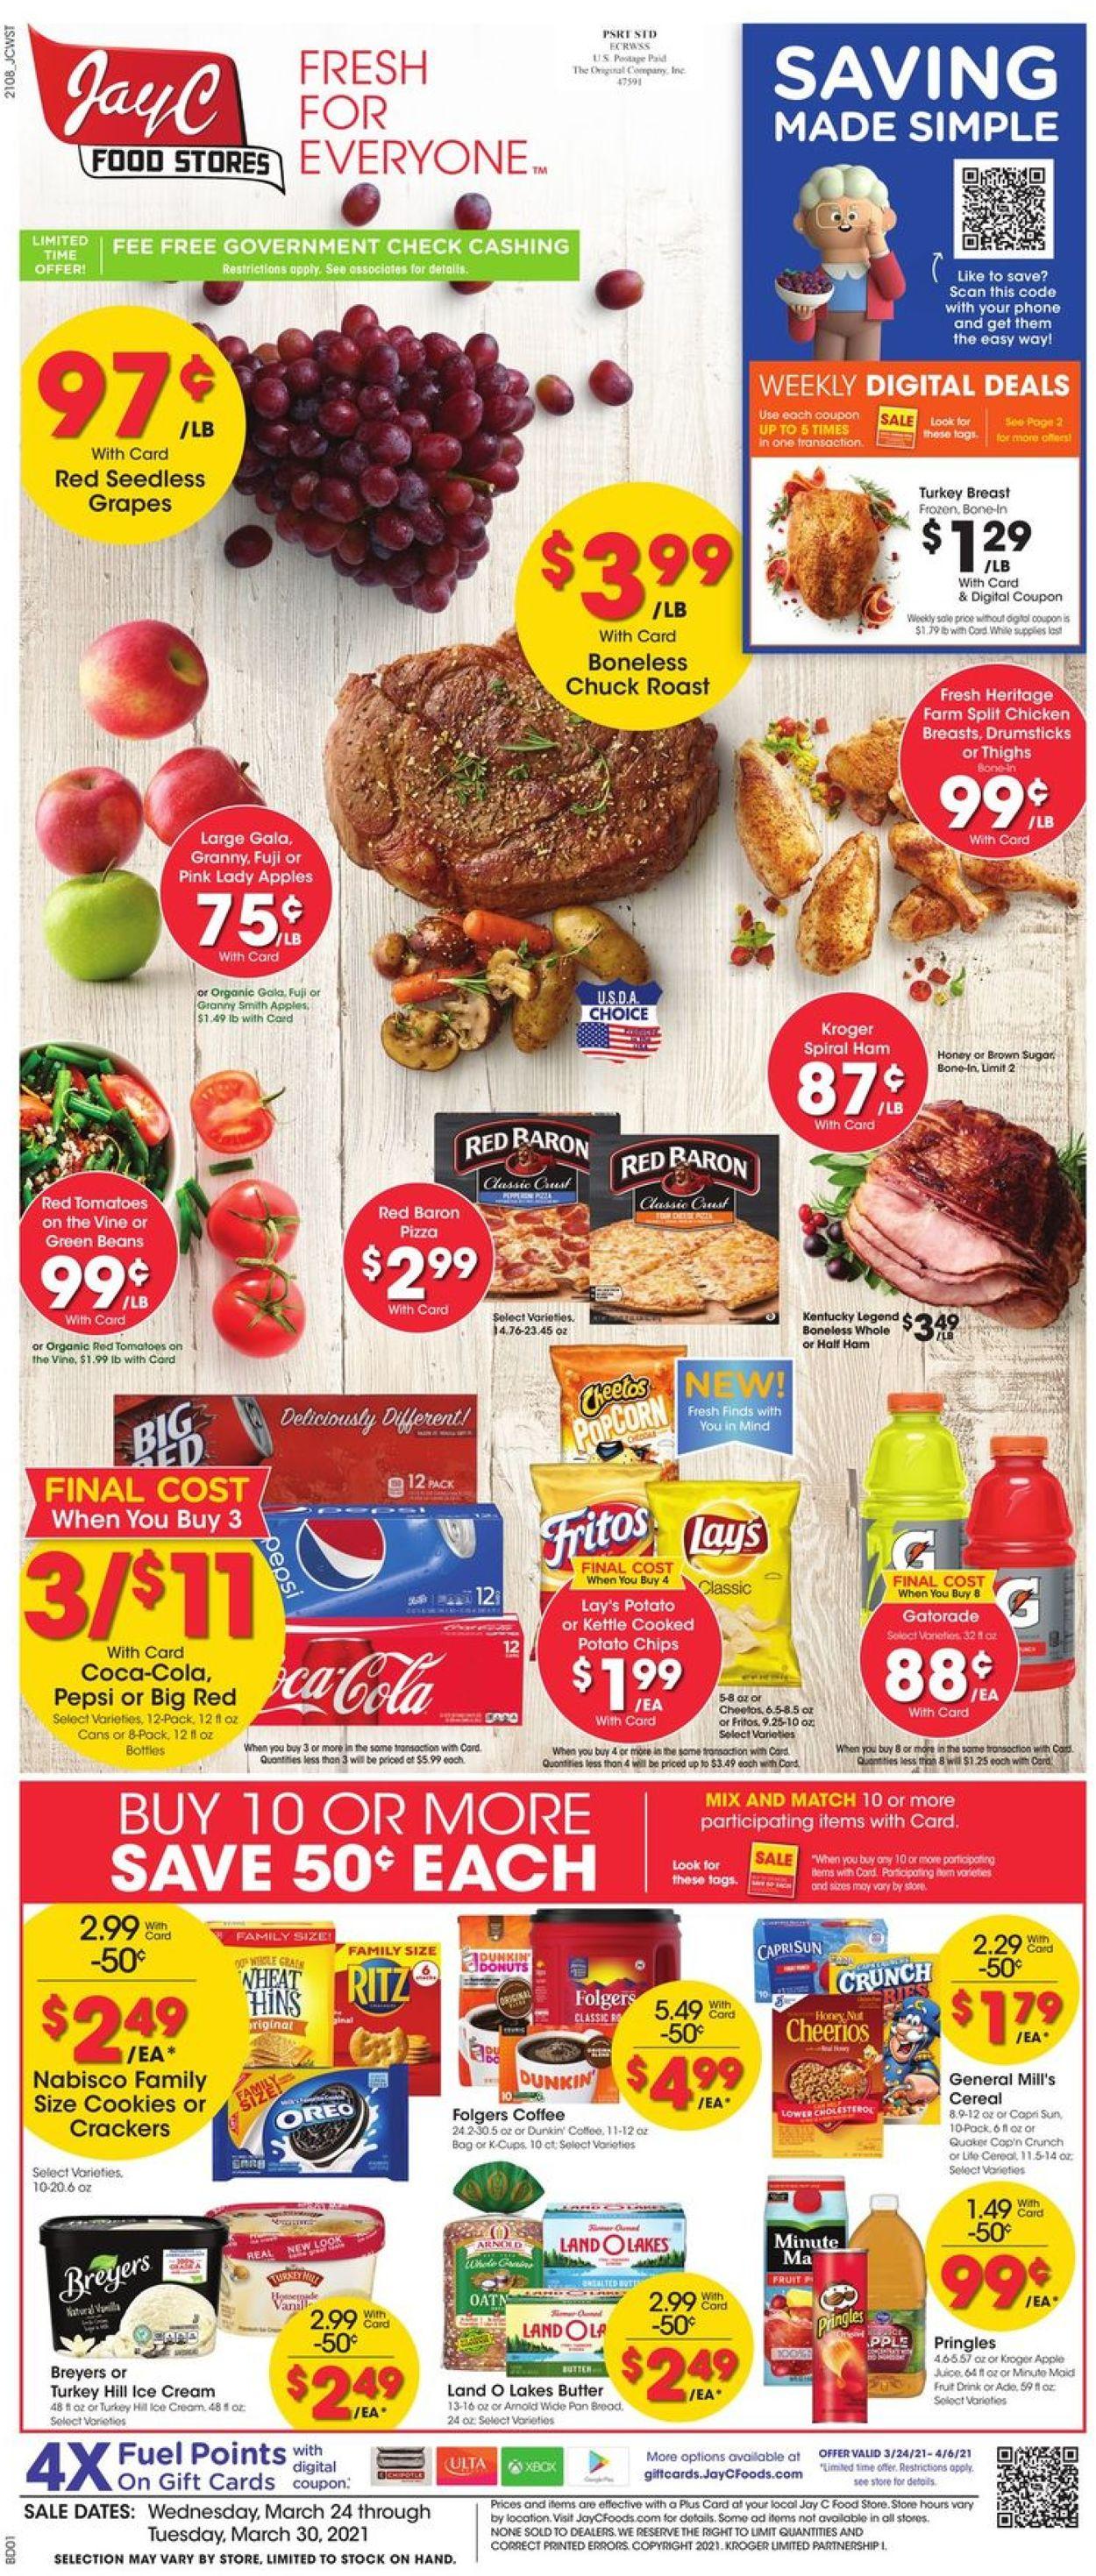 Jay C Food Stores Weekly Ad Circular - valid 03/24-03/30/2021